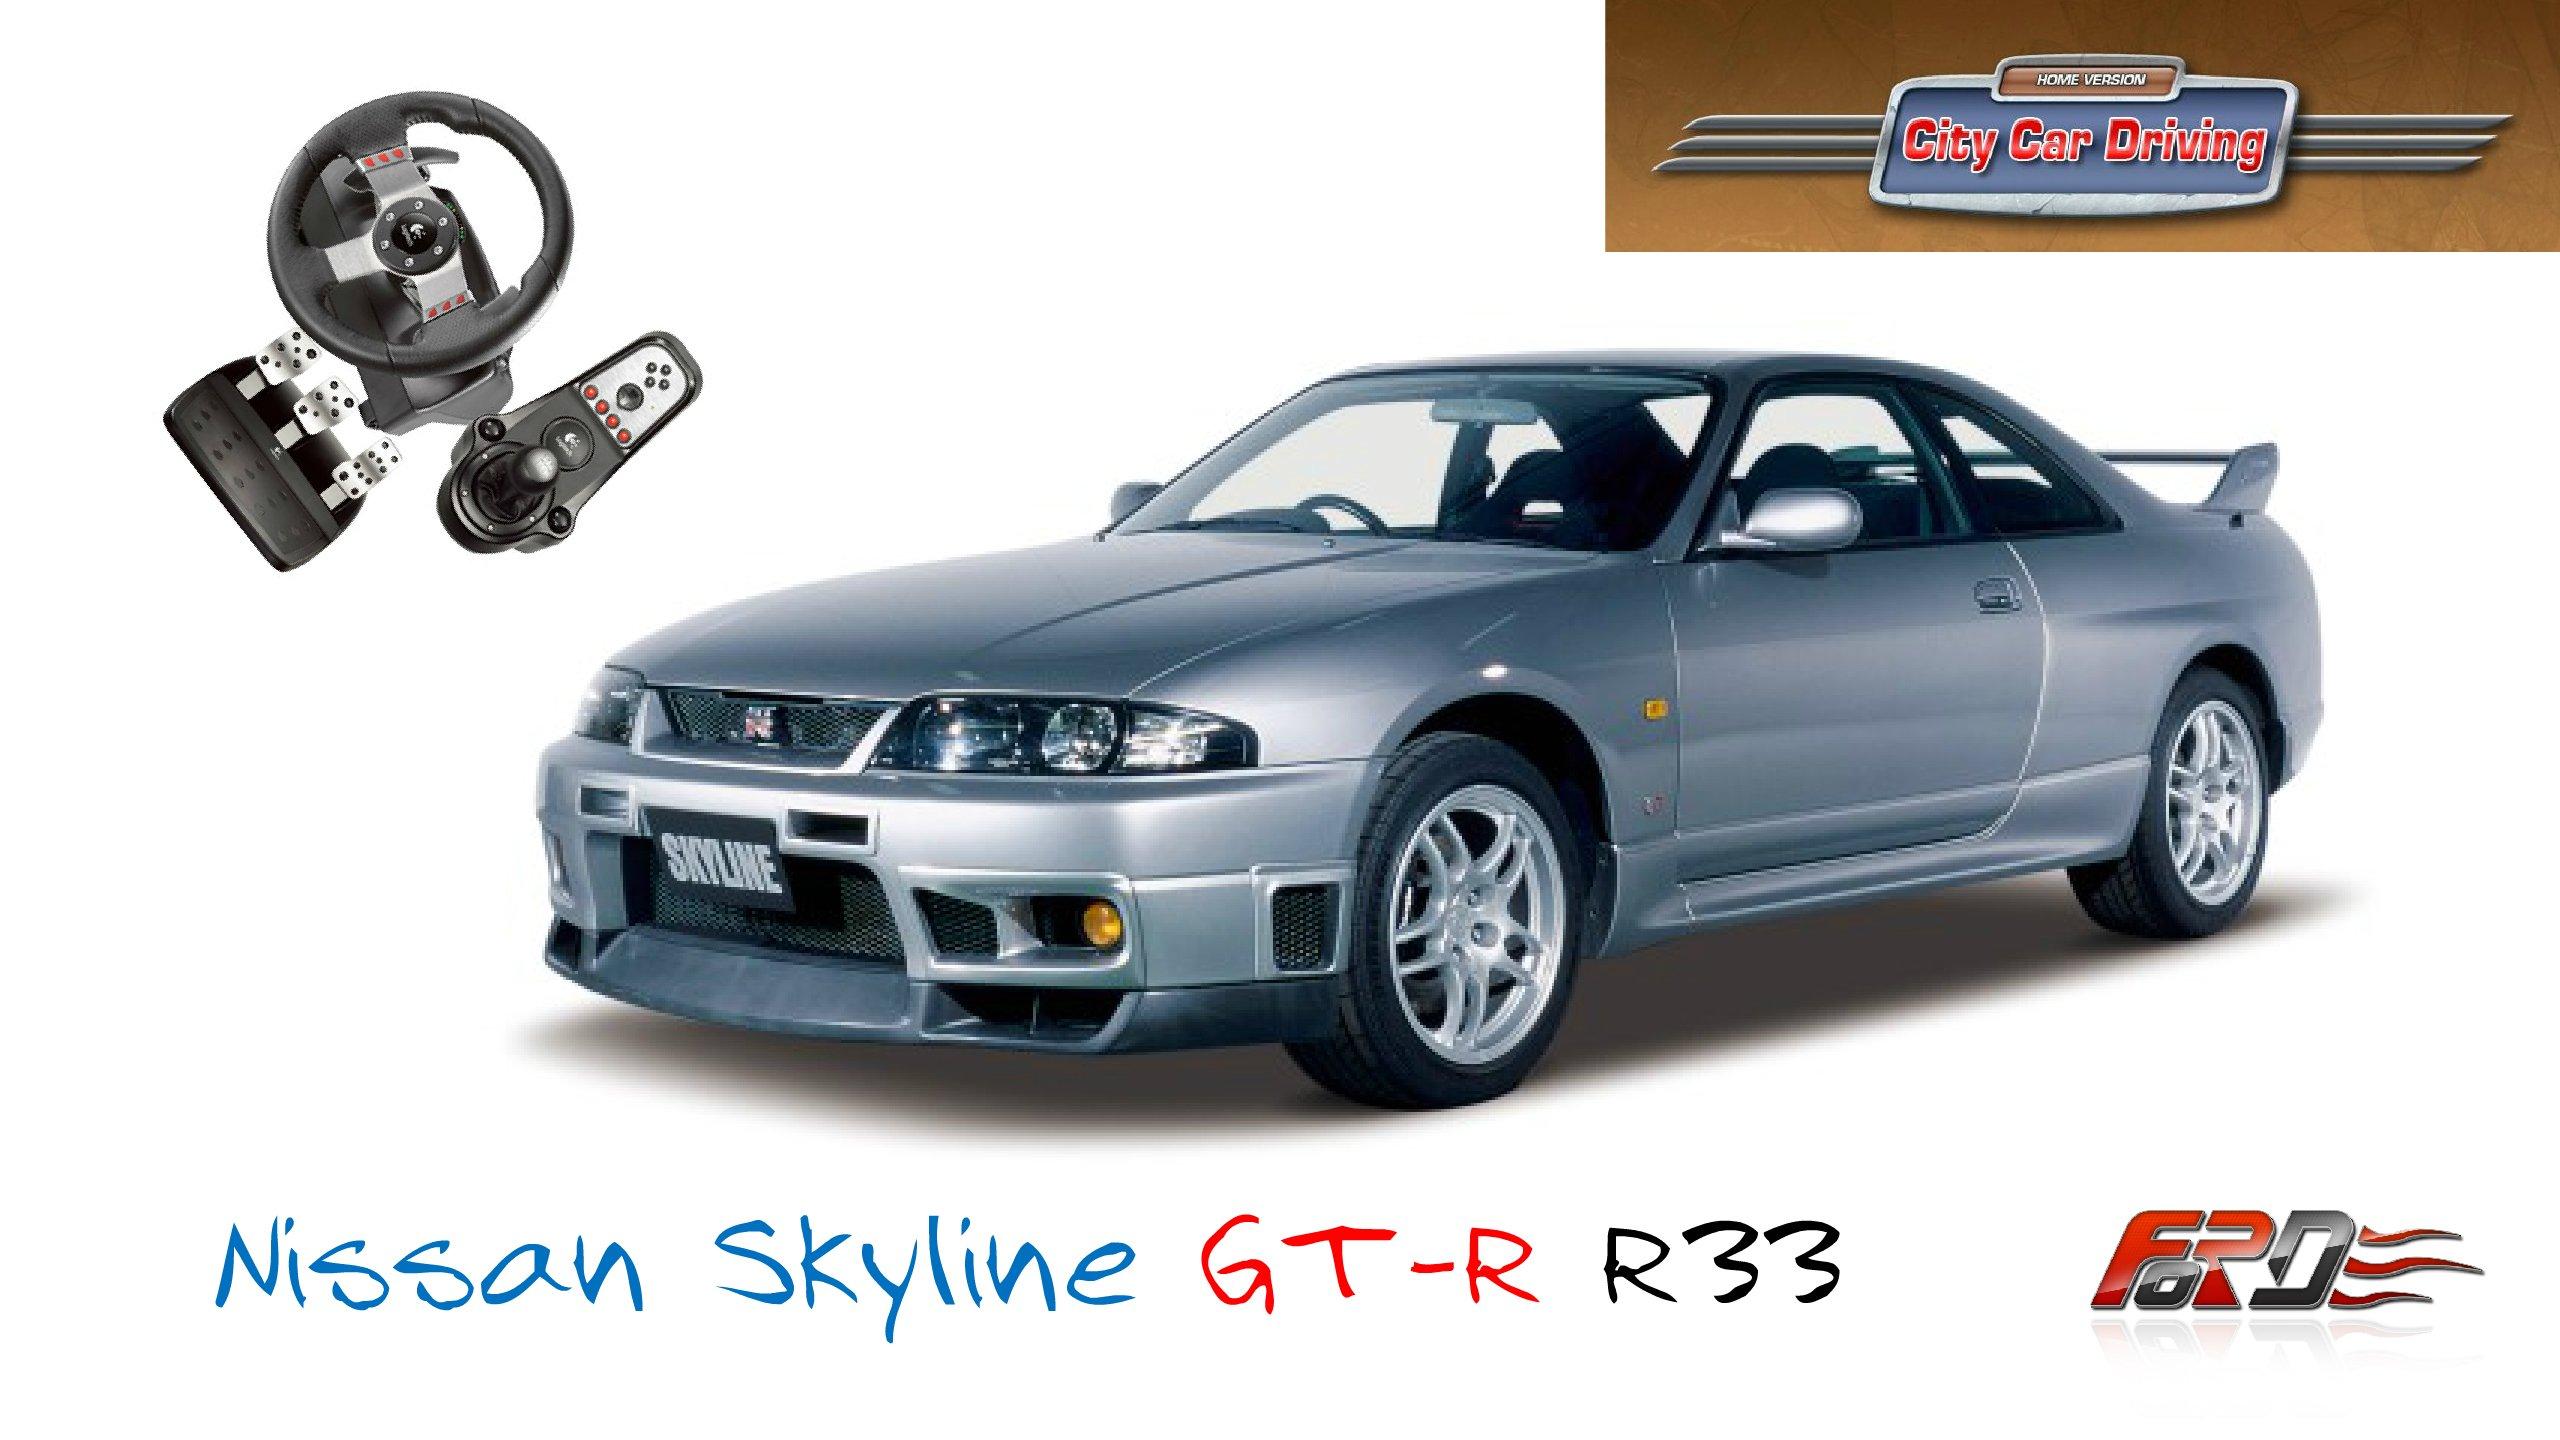 Nissan Skyline GTR R33 - тест-драйв, обзор, drift, японский корч City Car Driving . - Изображение 1